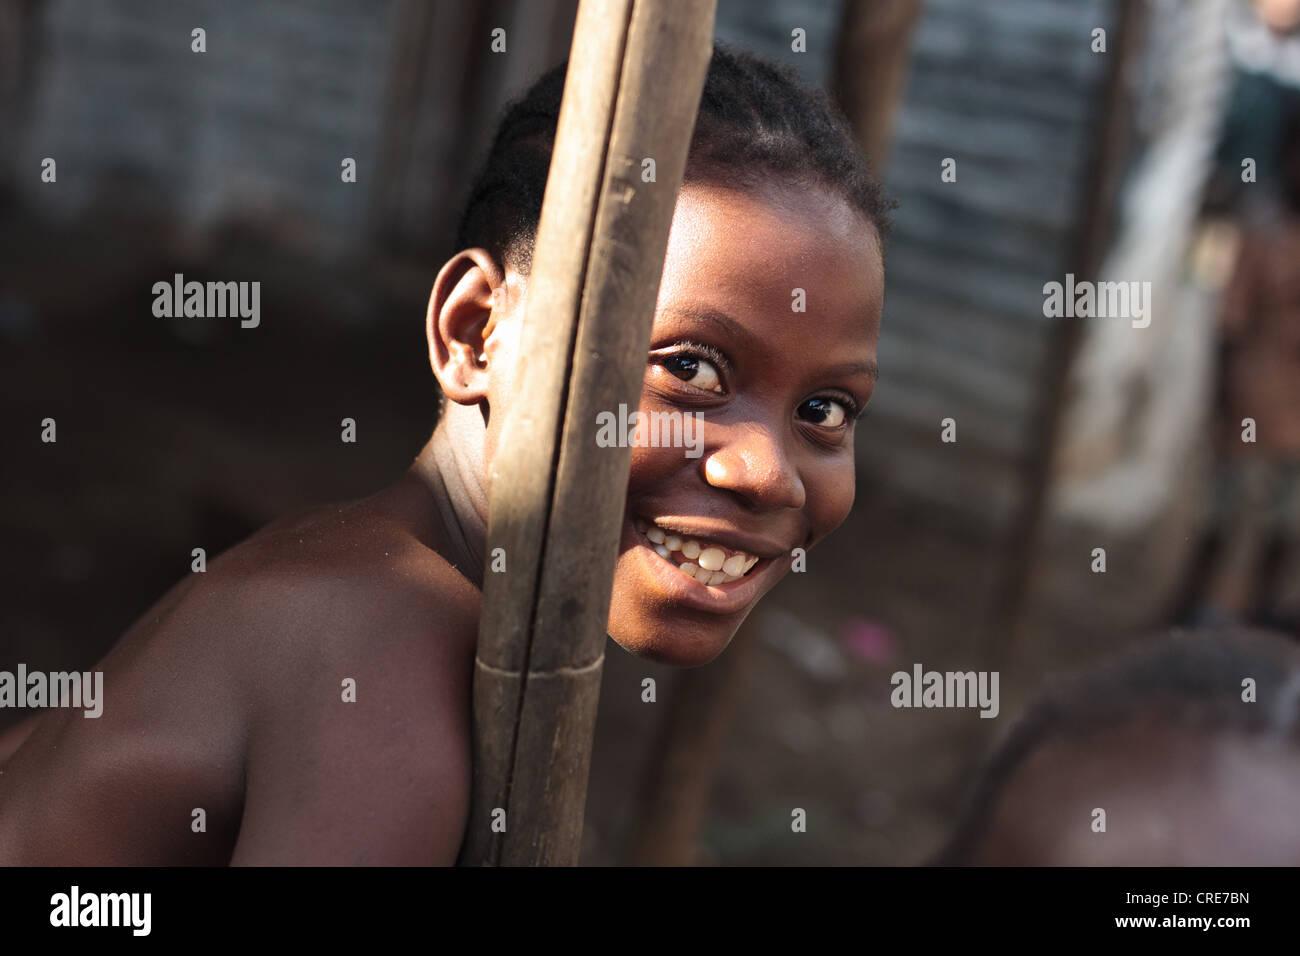 Portrait of a girl in the Clara Town slum of Monrovia, Montserrado county, Liberia on Thursday April 5, 2012. - Stock Image